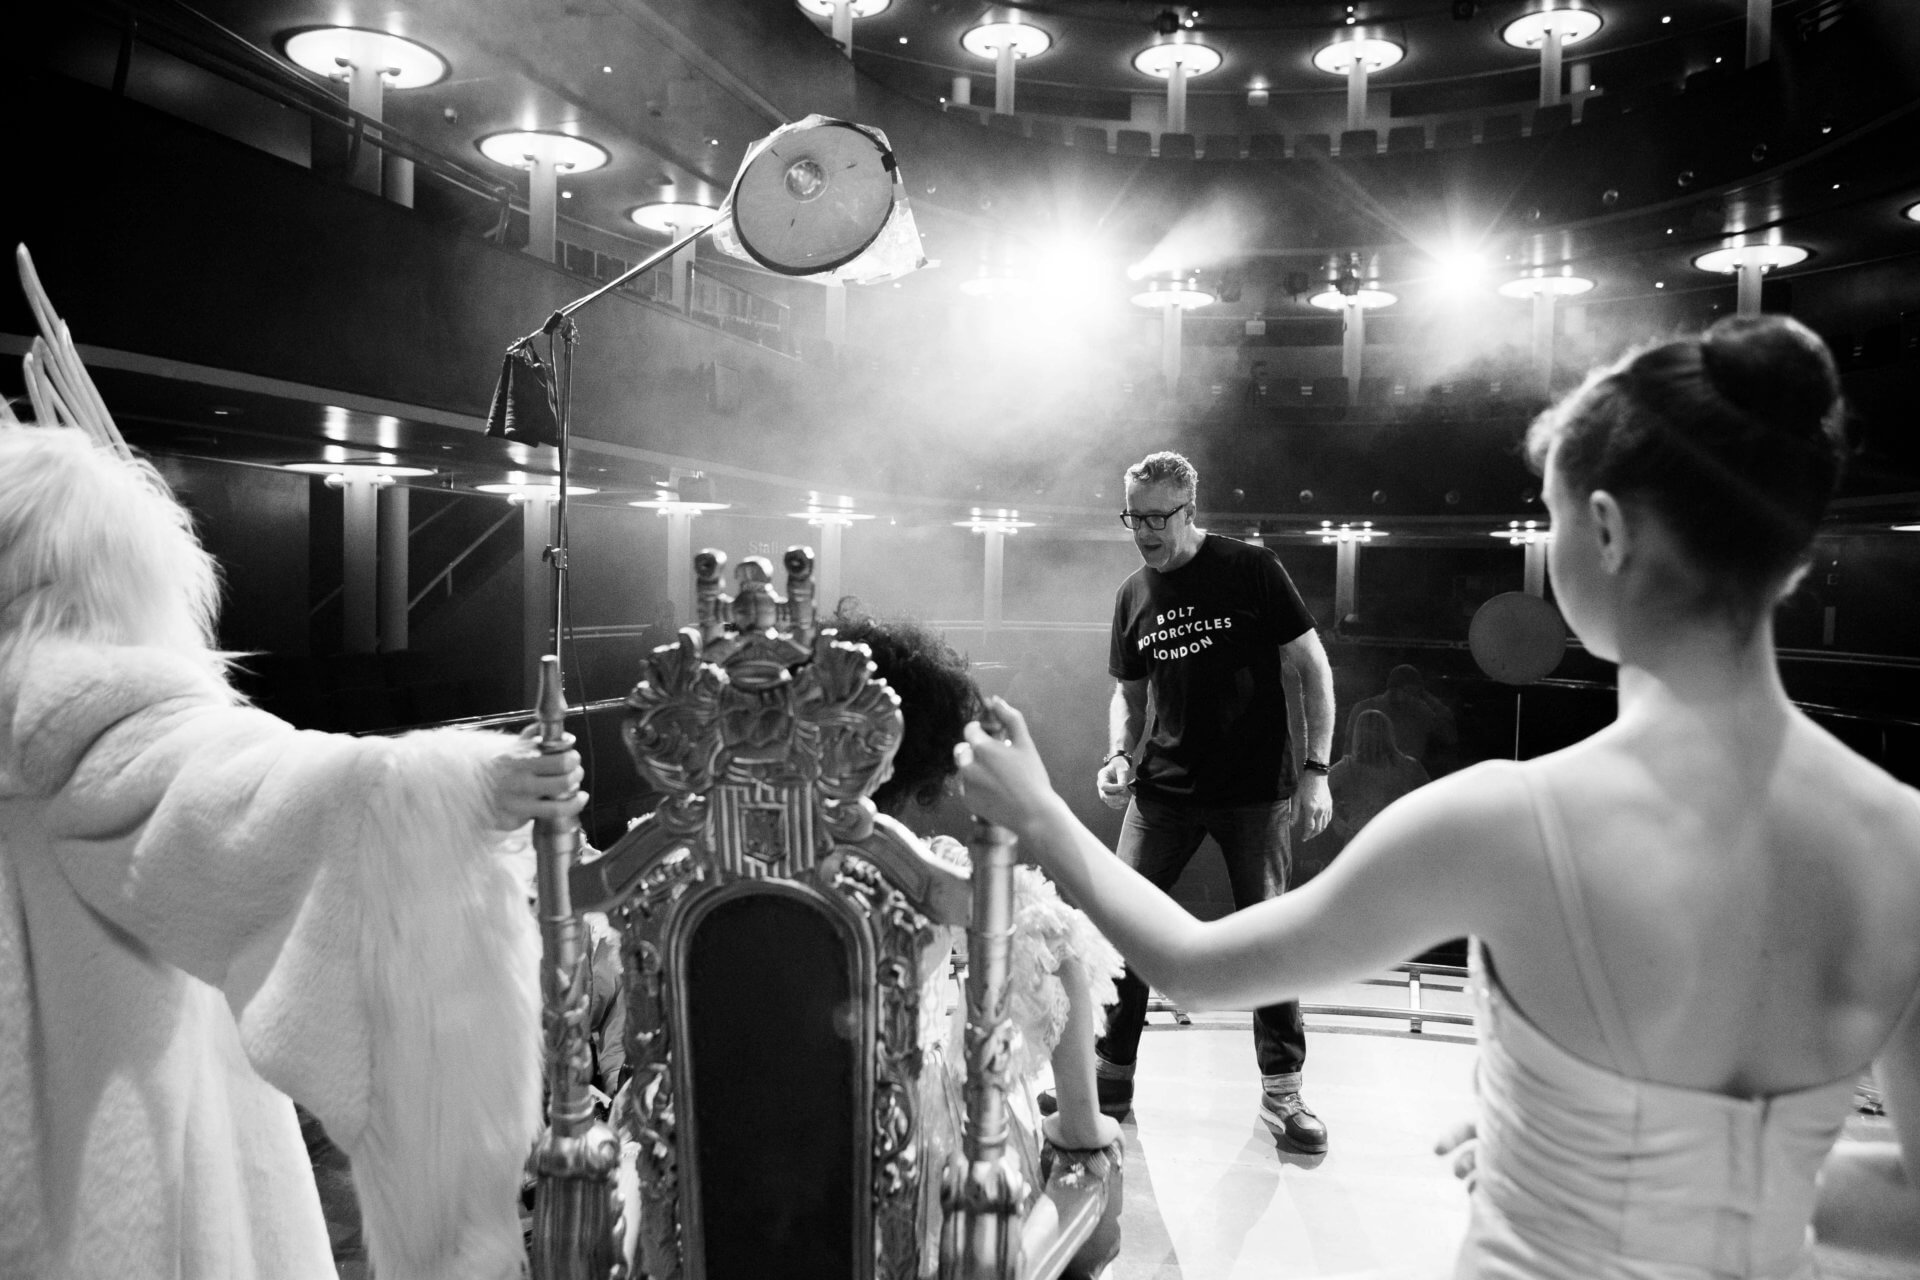 Photographer Guy Farrow on stage